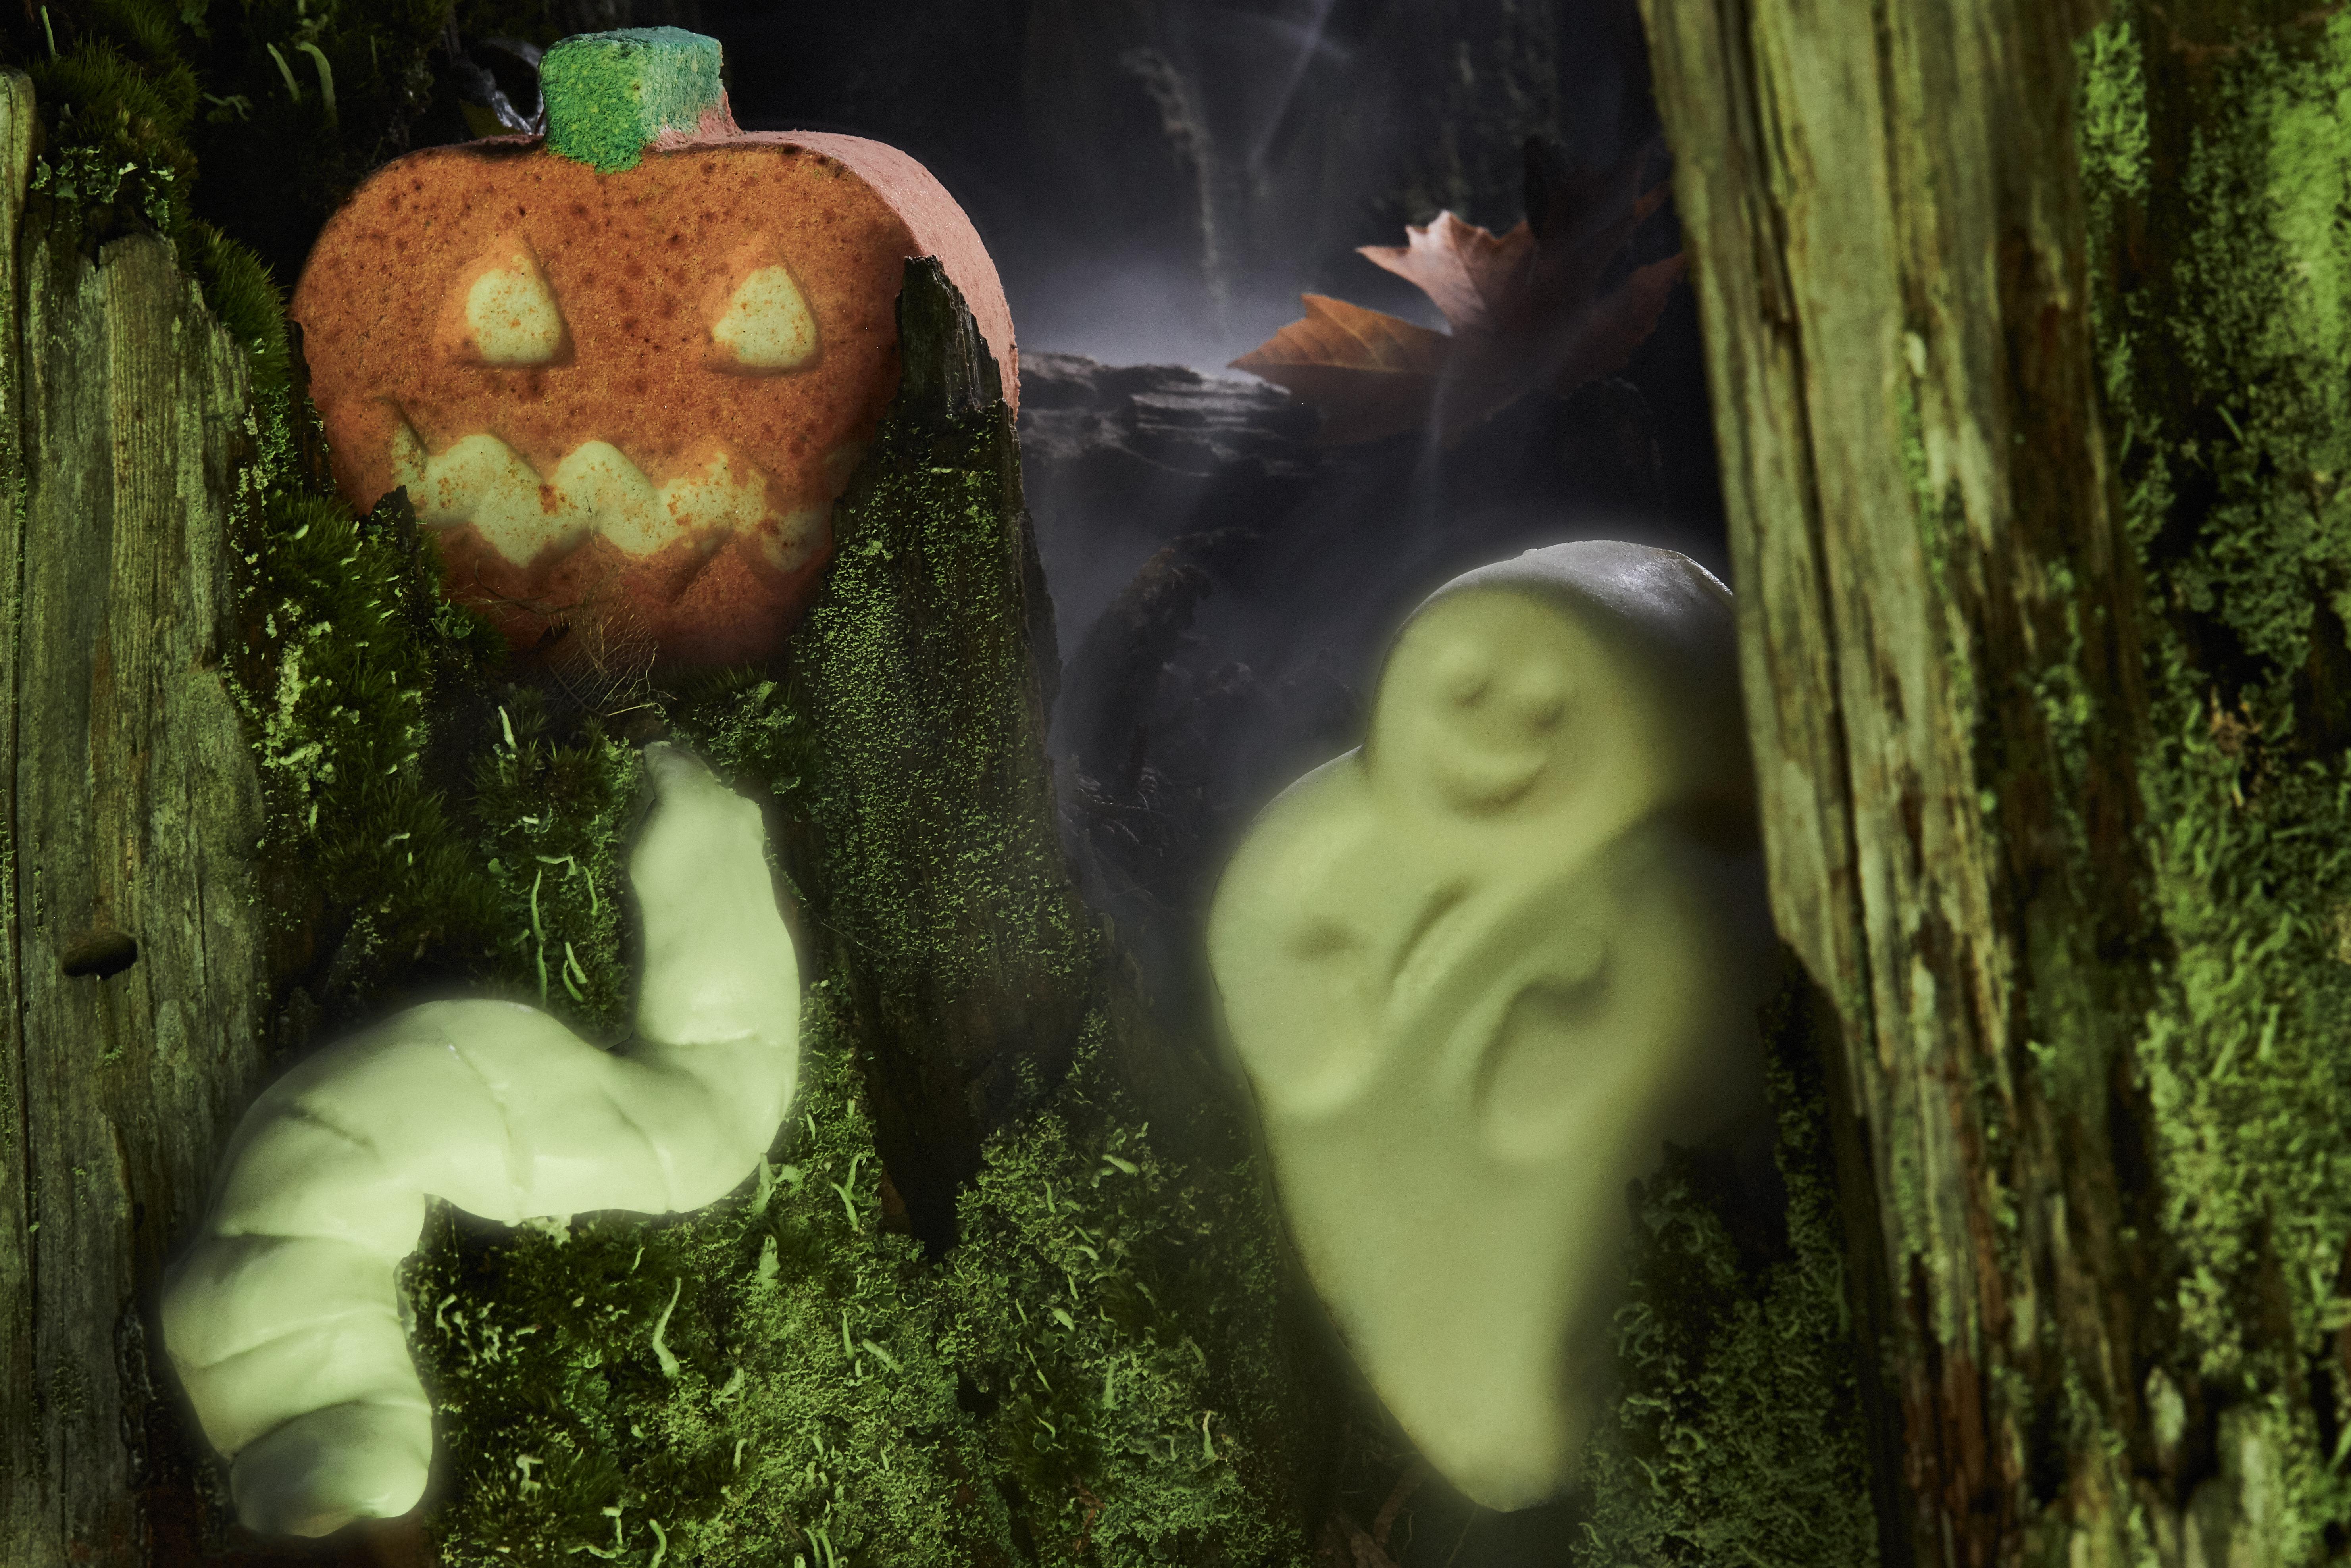 A Punkin Pumpkin Bath Bomb, Ghost In The Dark Soap and Glow Worm Fun nestled in a spooky, mossy tree.